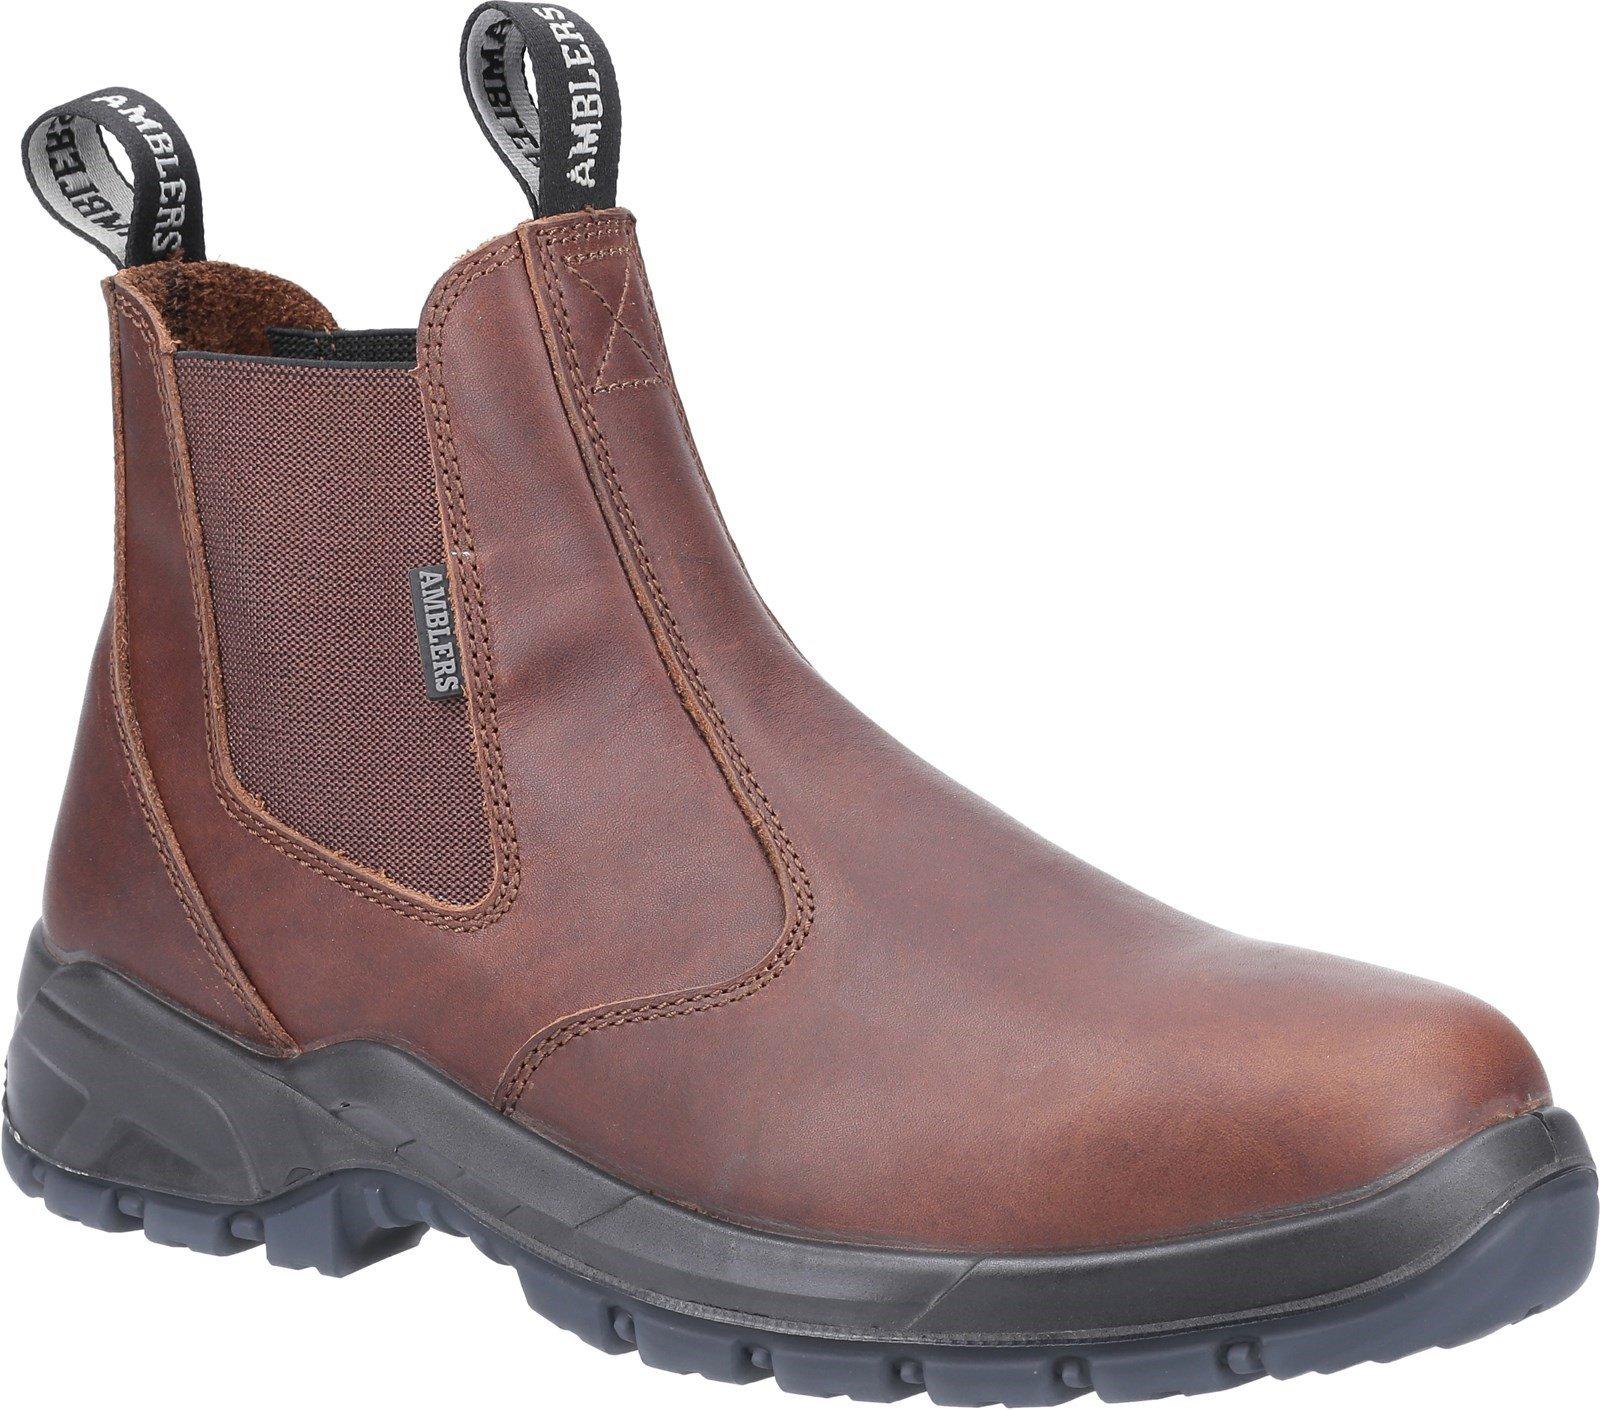 Amblers Unisex Ardwell Occupational Dealer Boot Brown 31379 - Brown 4